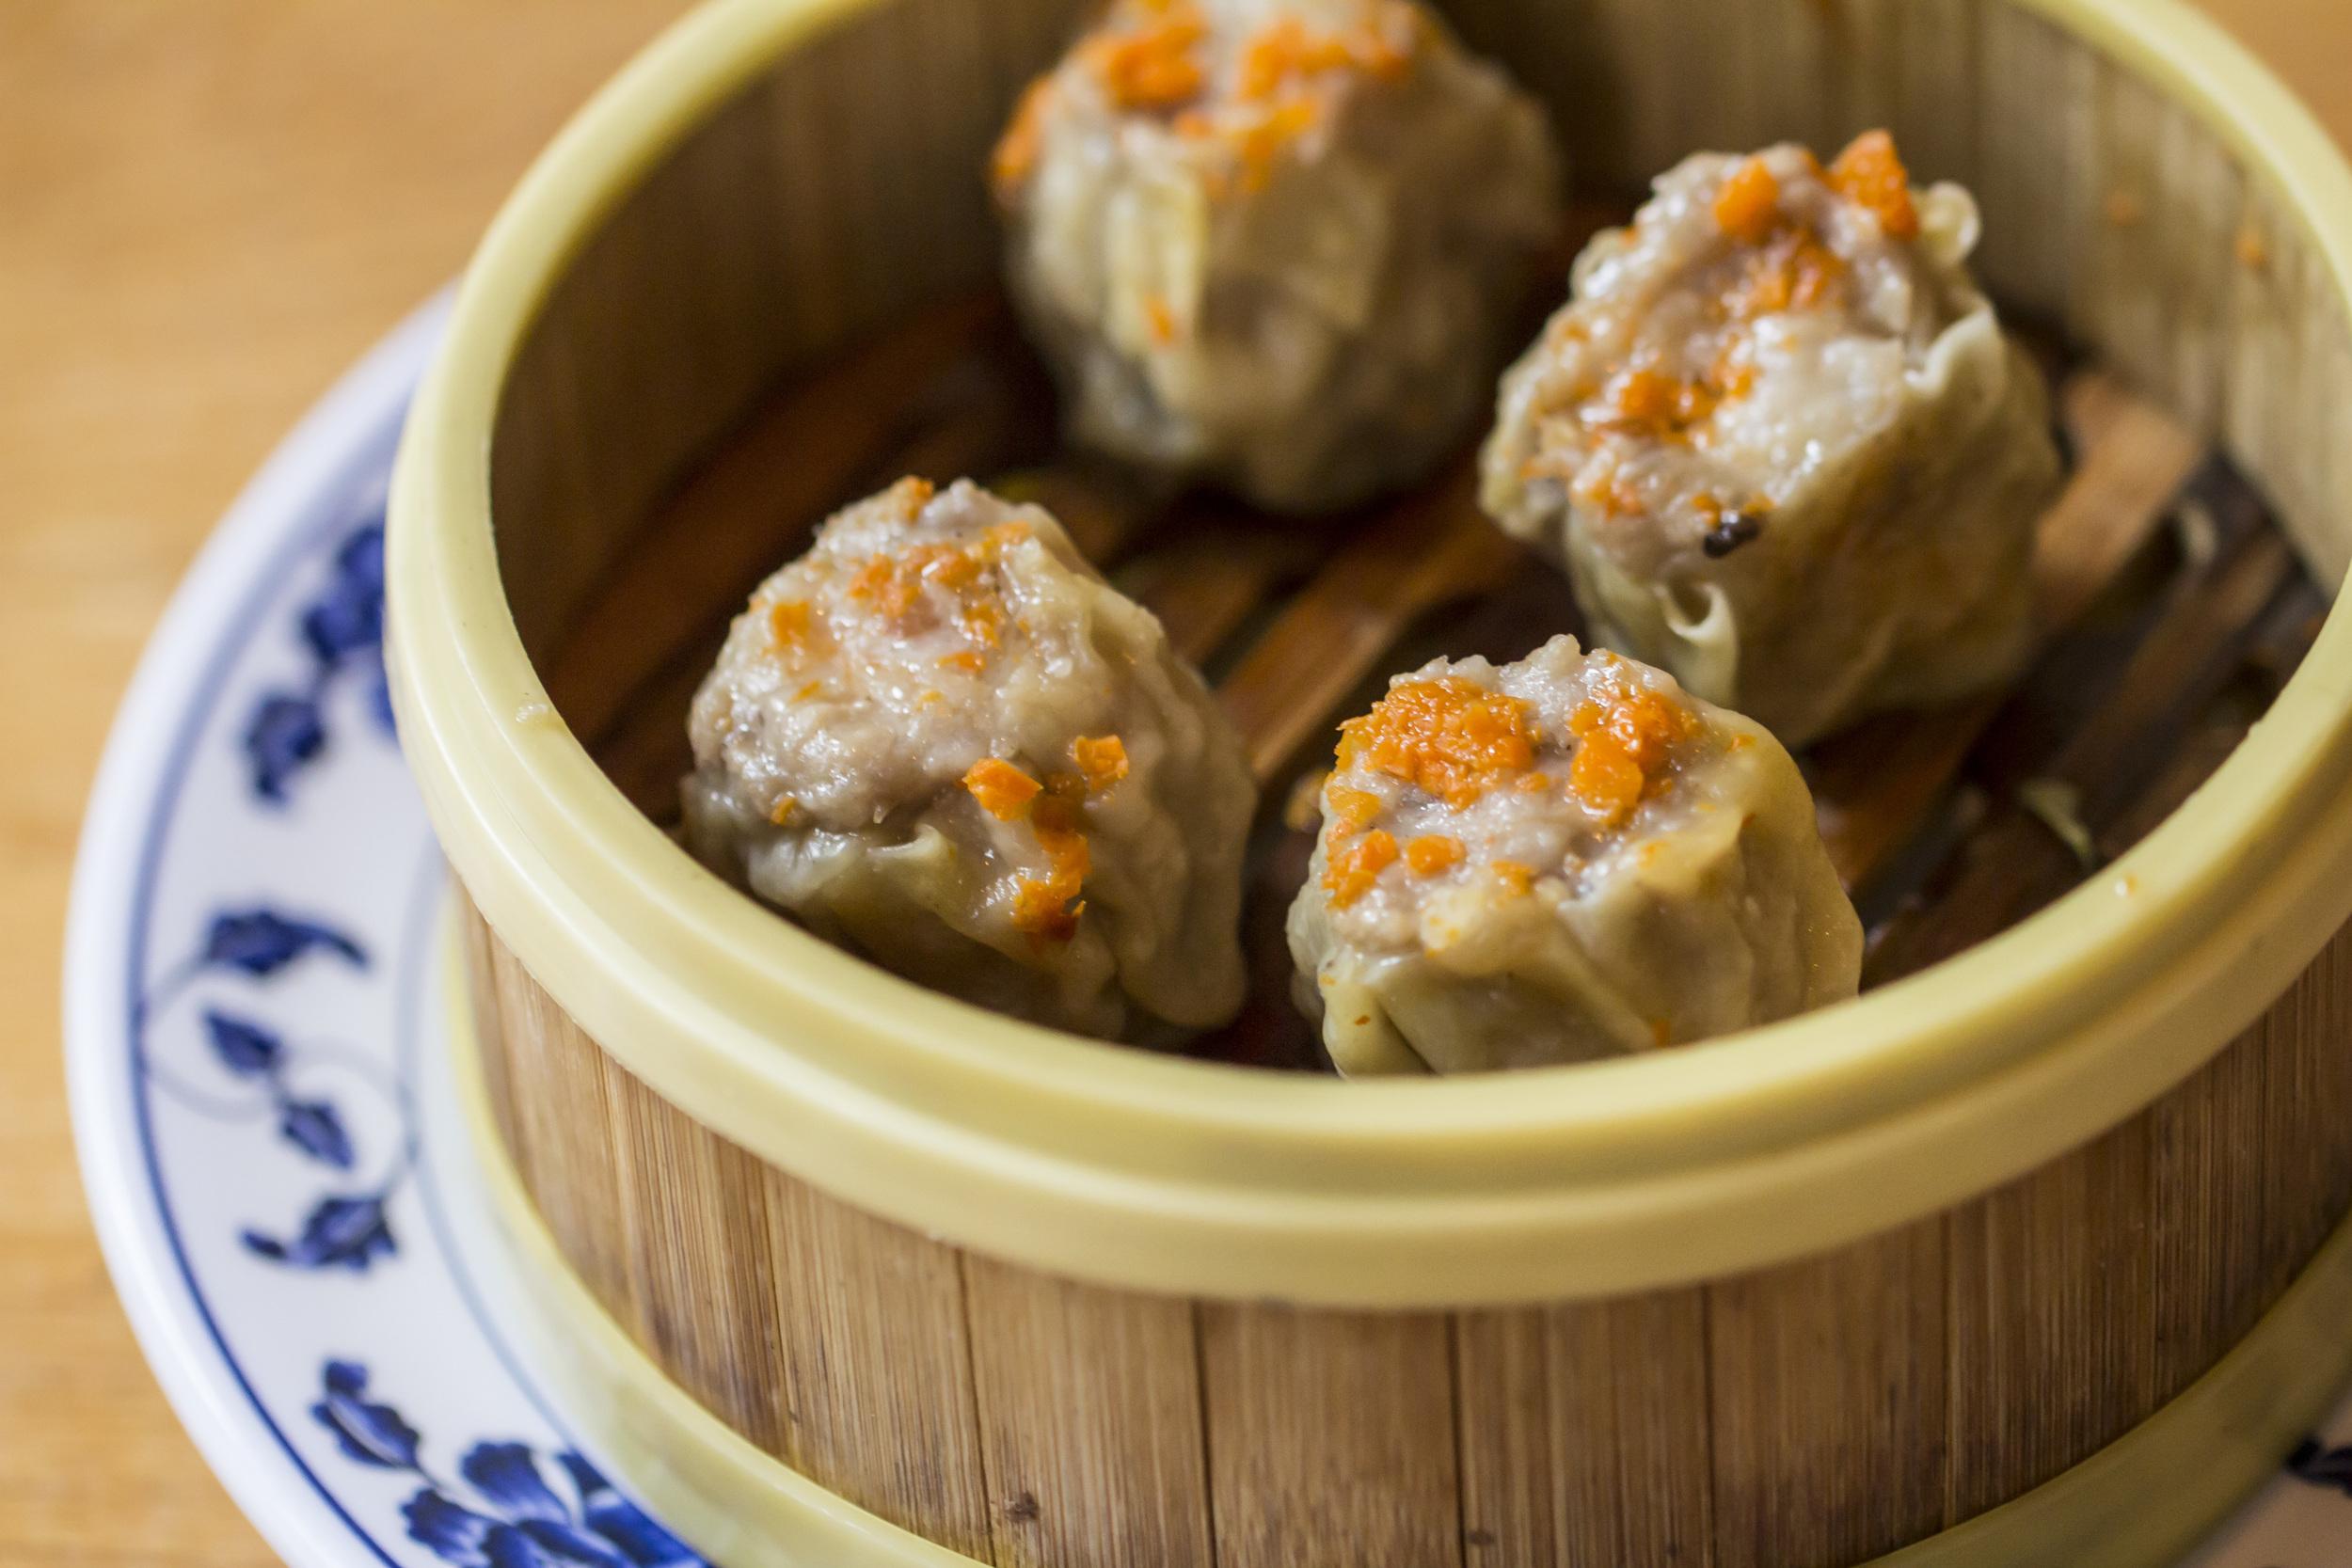 9-15-15 Modern China Photos Food and Bev_9.JPG